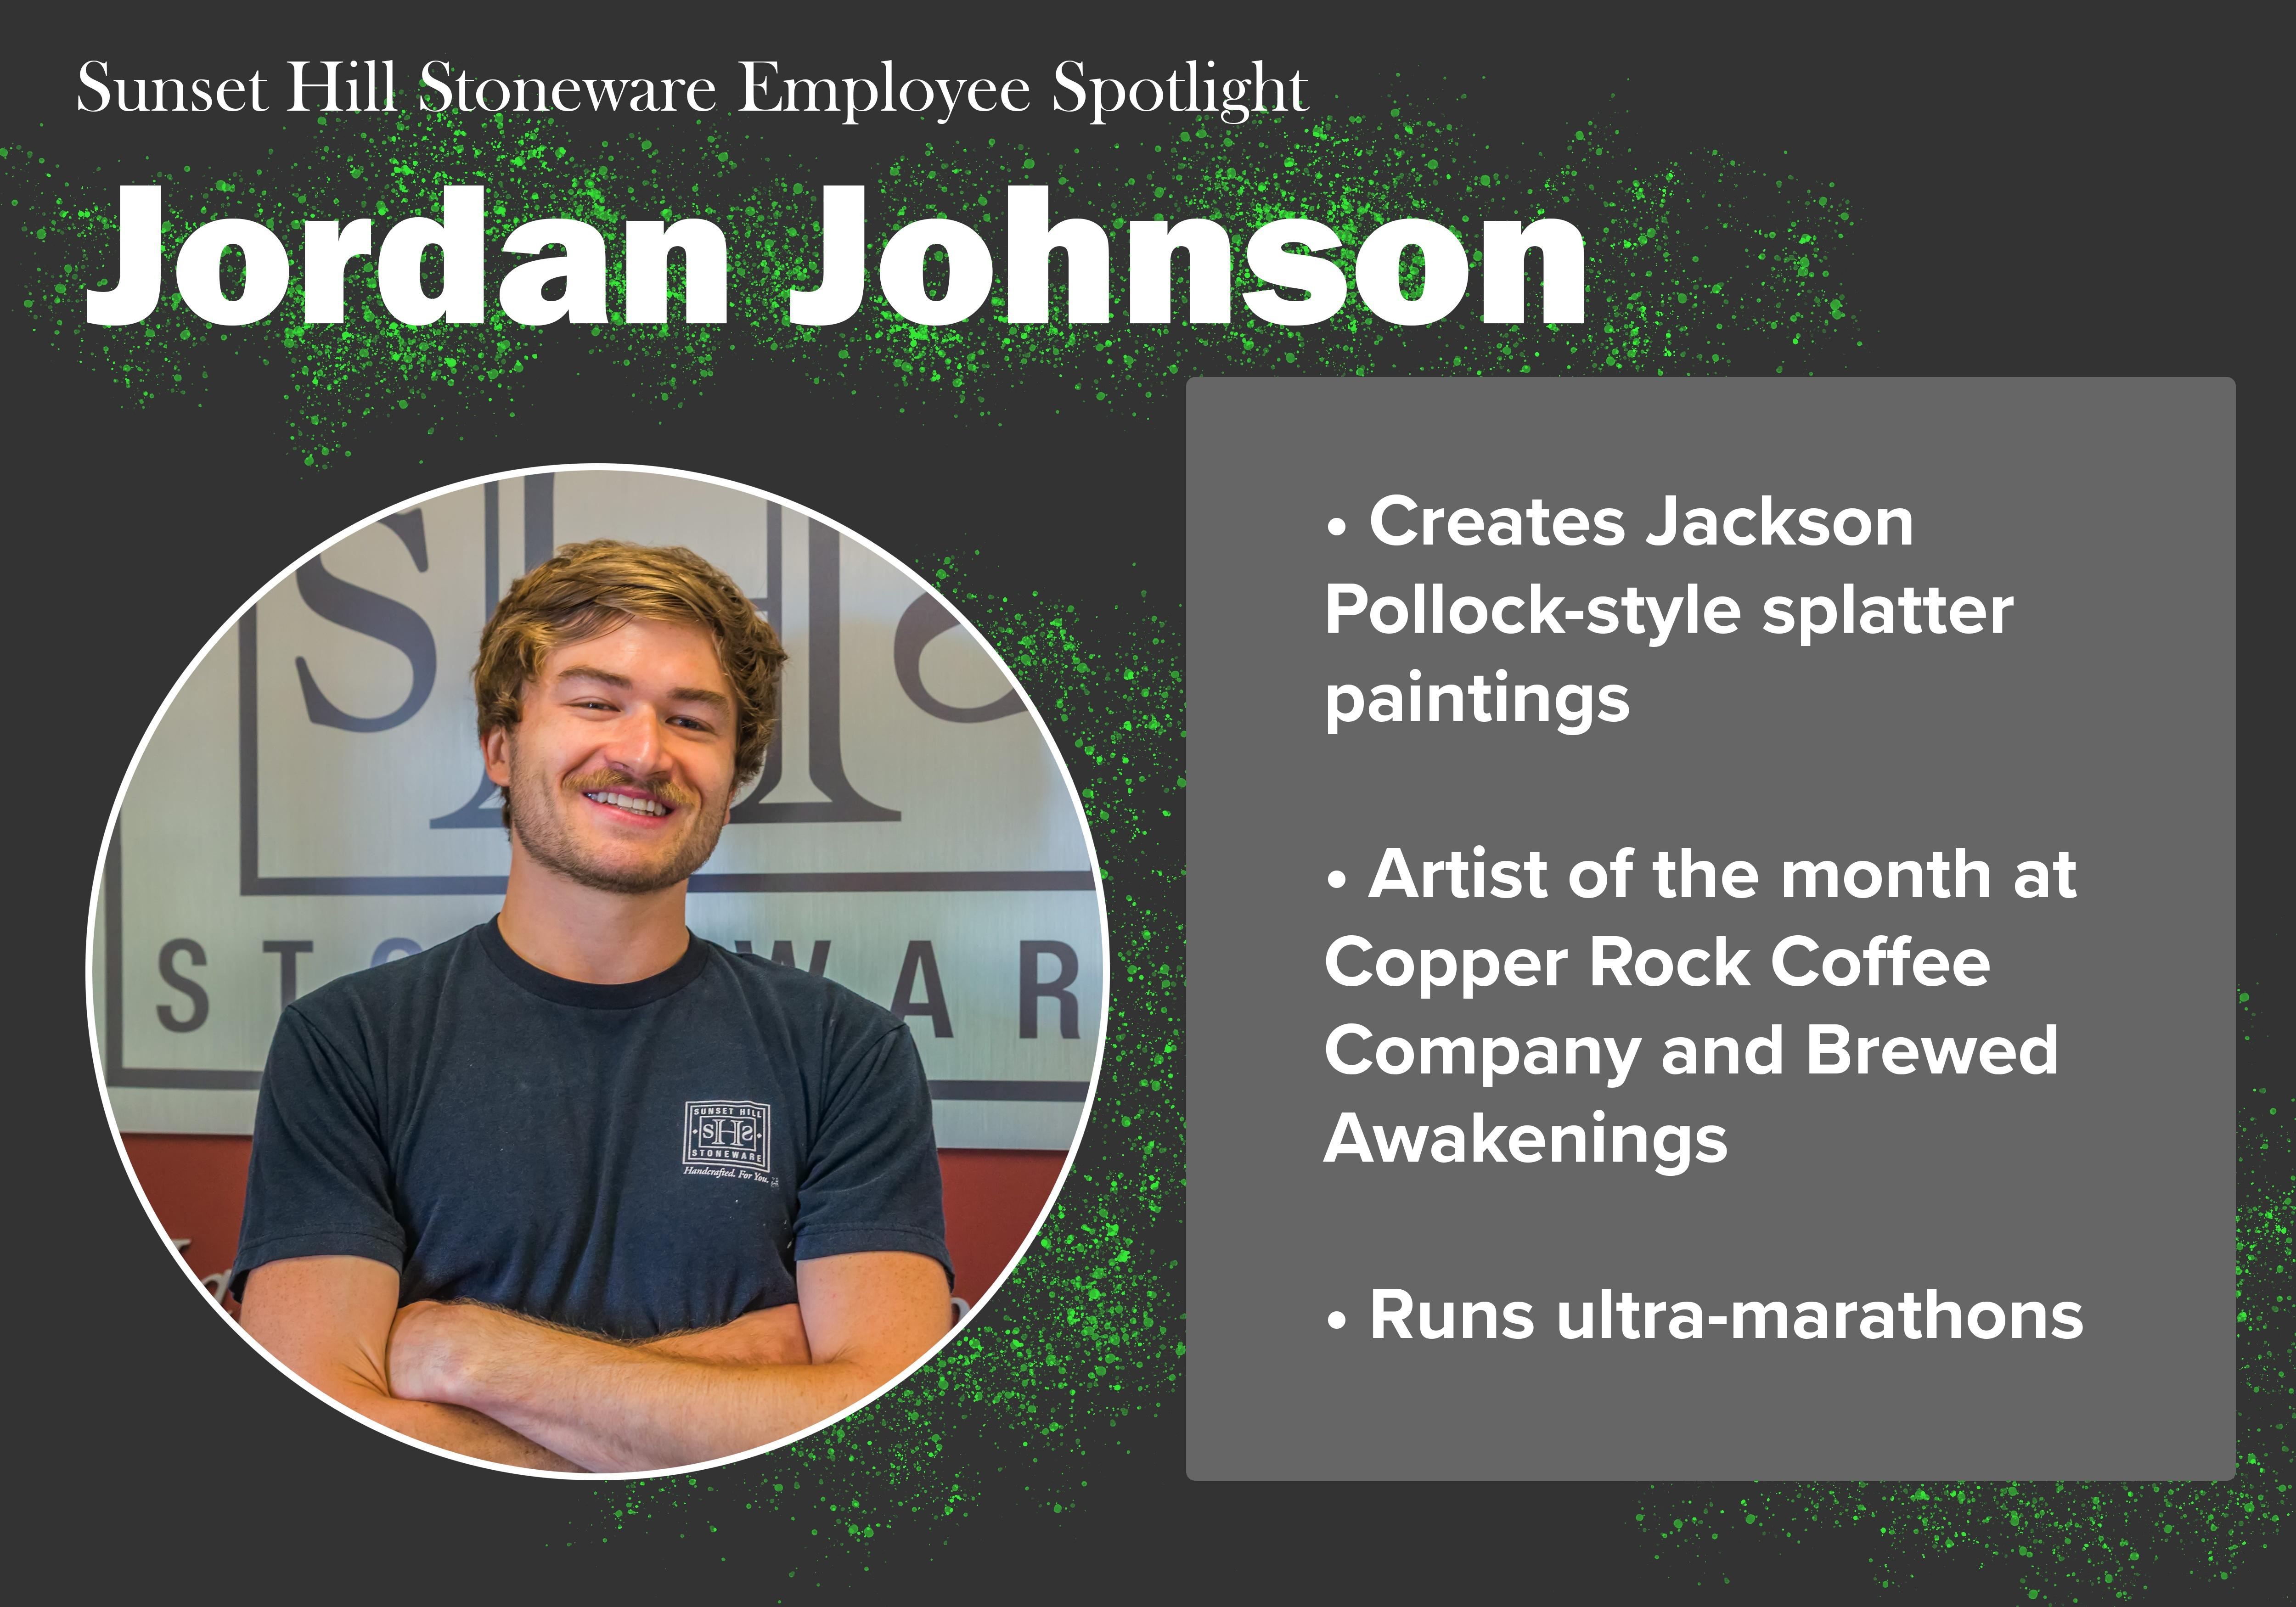 Sunset Hill Stoneware Employee Spotlight: Jordan Johnson